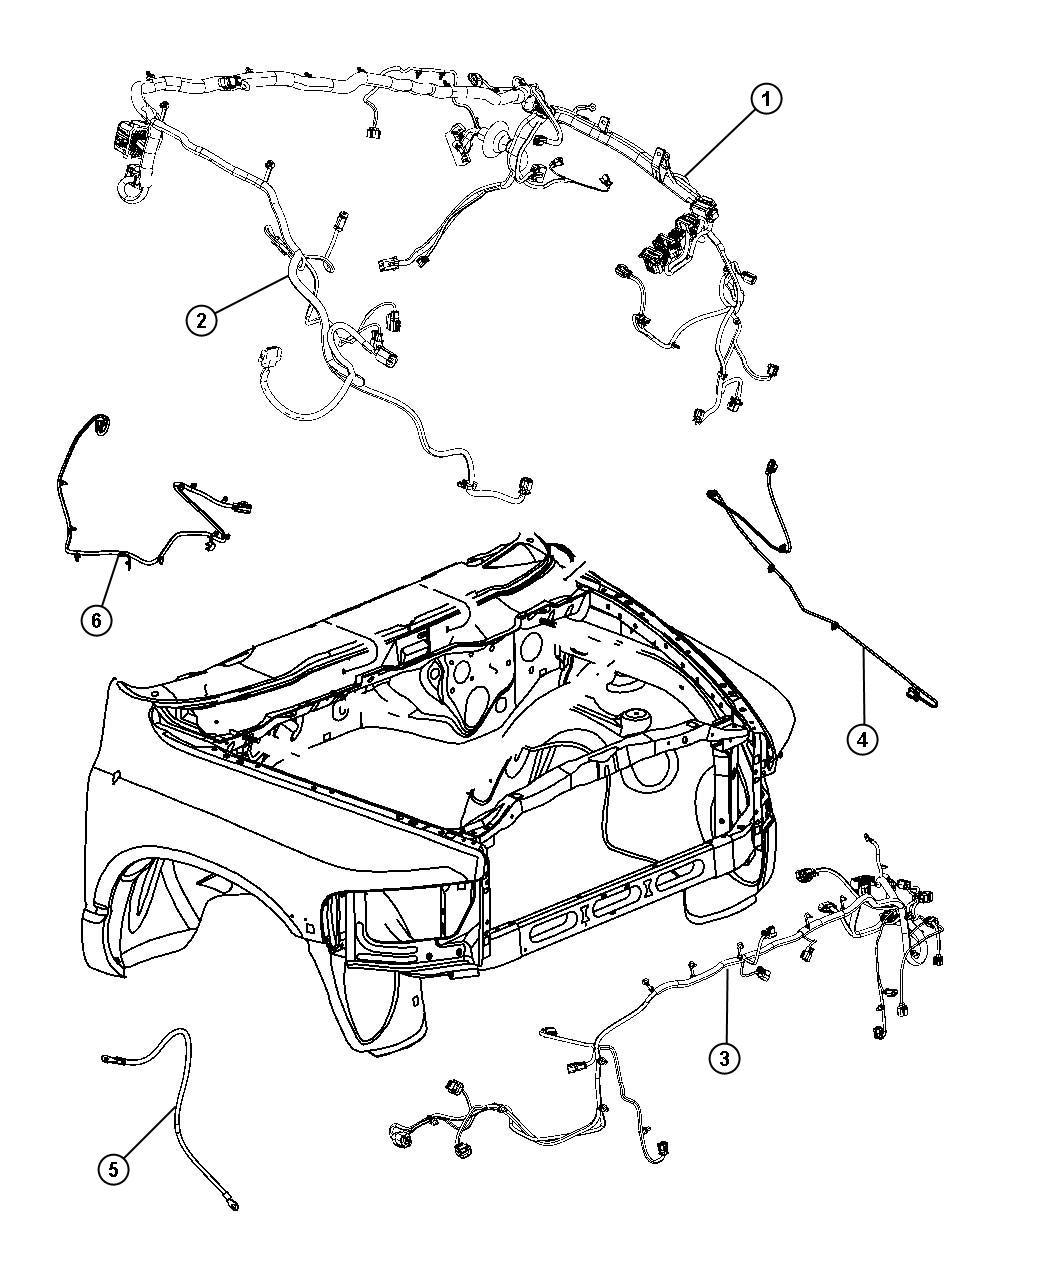 Dodge Ram 2500 Wiring. Front end module. [fog lamps], [fog